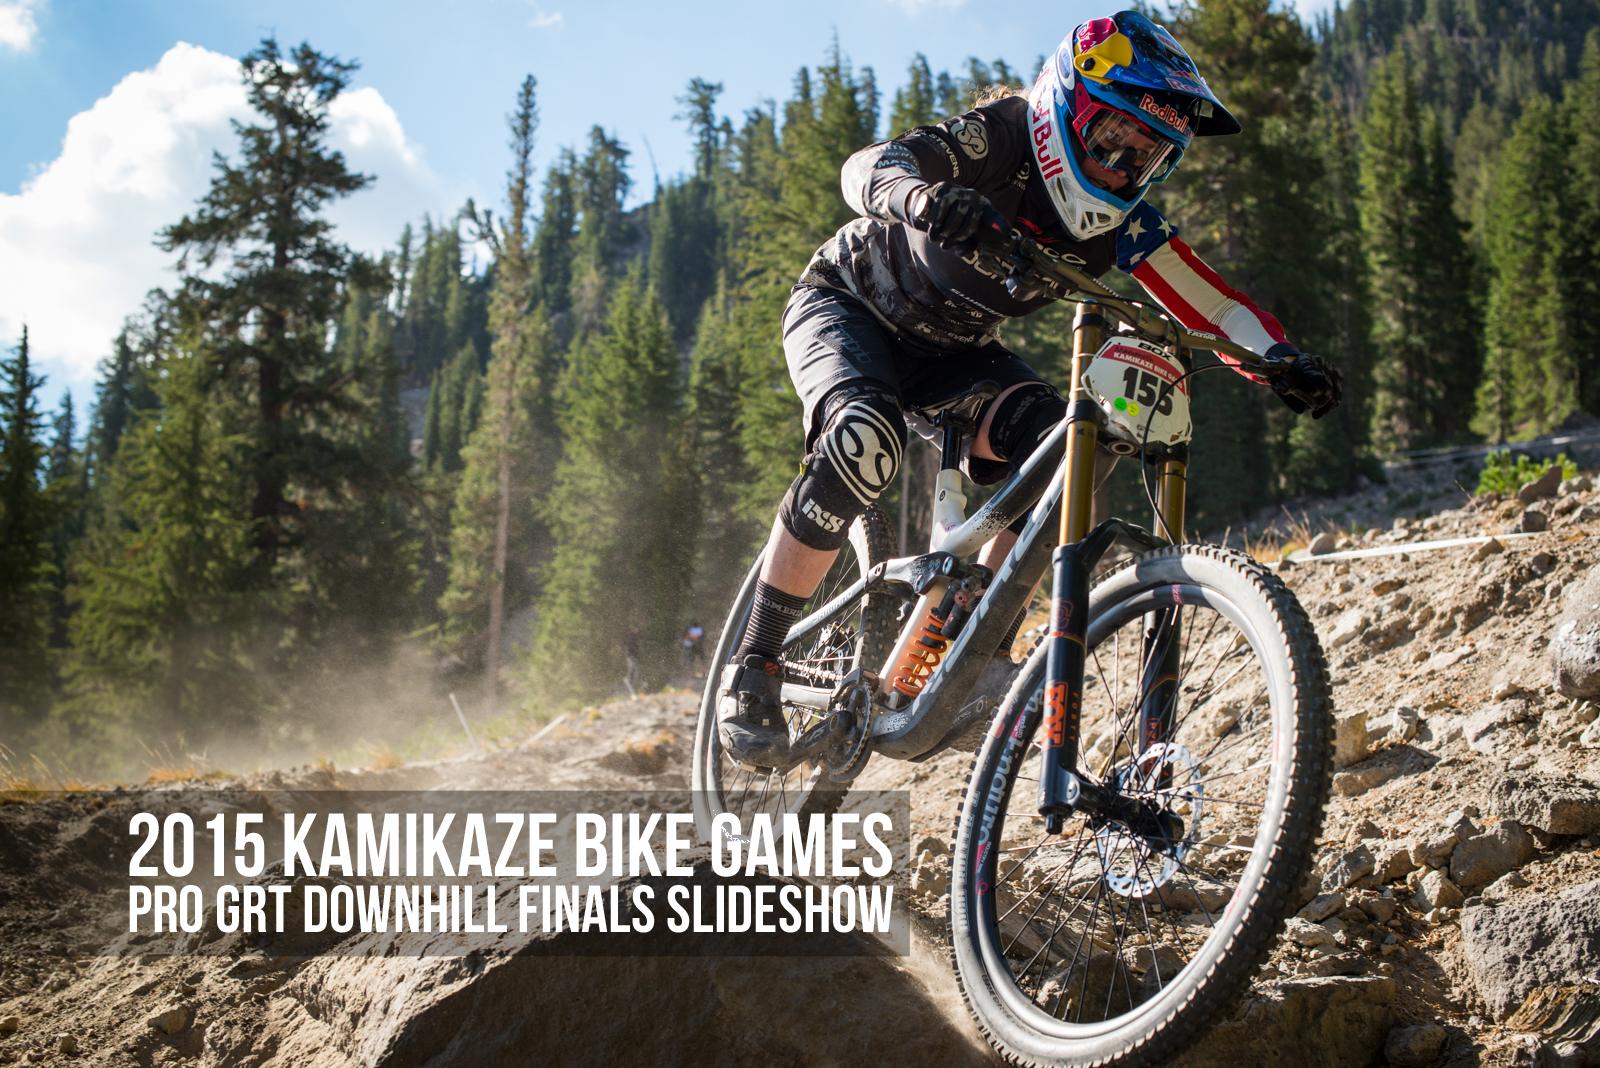 mammoth kamikaze bike games